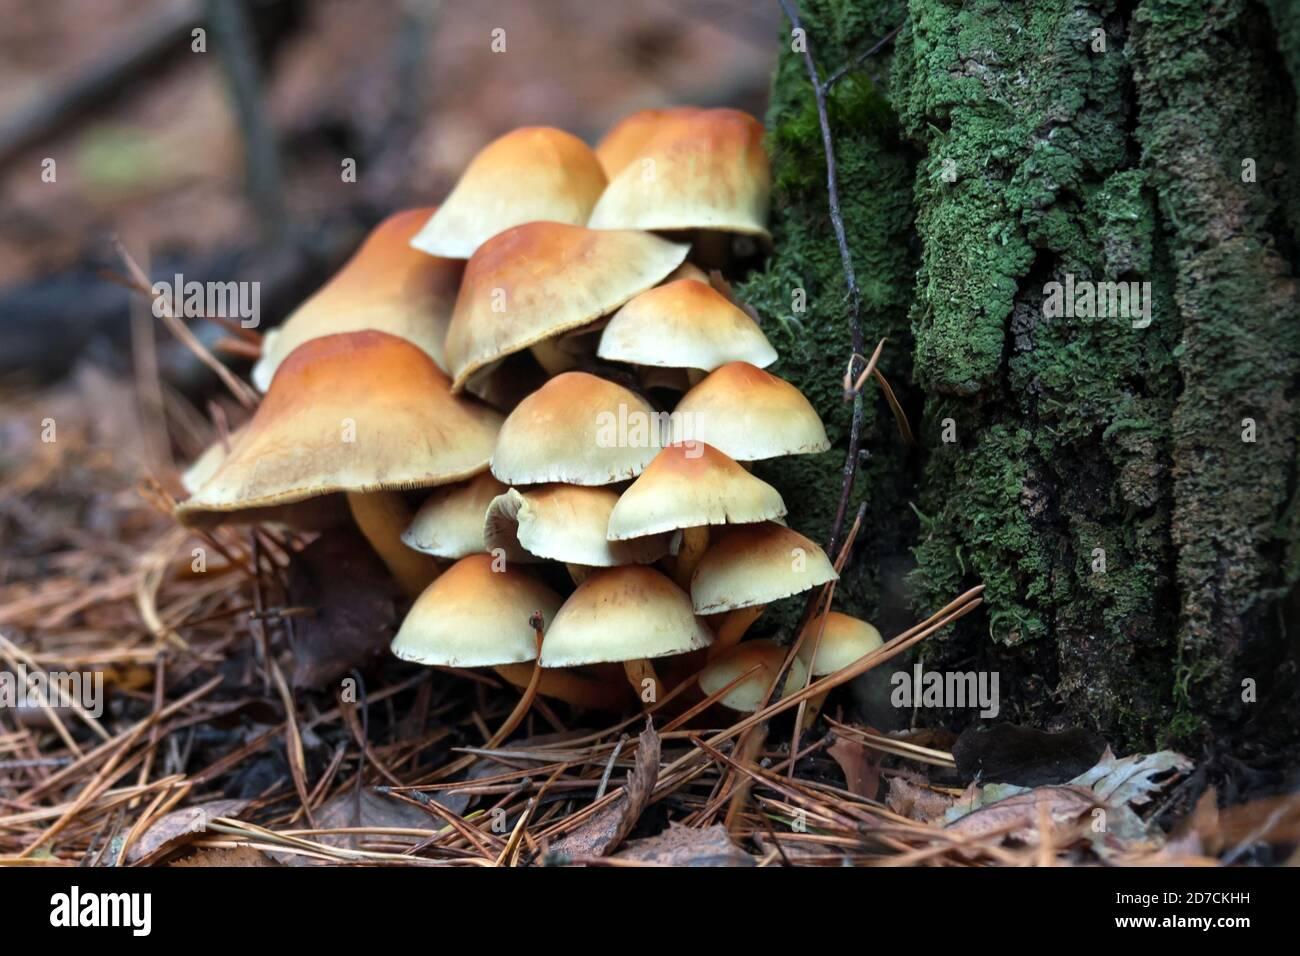 Enokitake mushroom, enoki, futu, seafood mushroom, growing edible gourmet and medicinal fungi on trees. Fungi growing in autumn pine forest Stock Photo